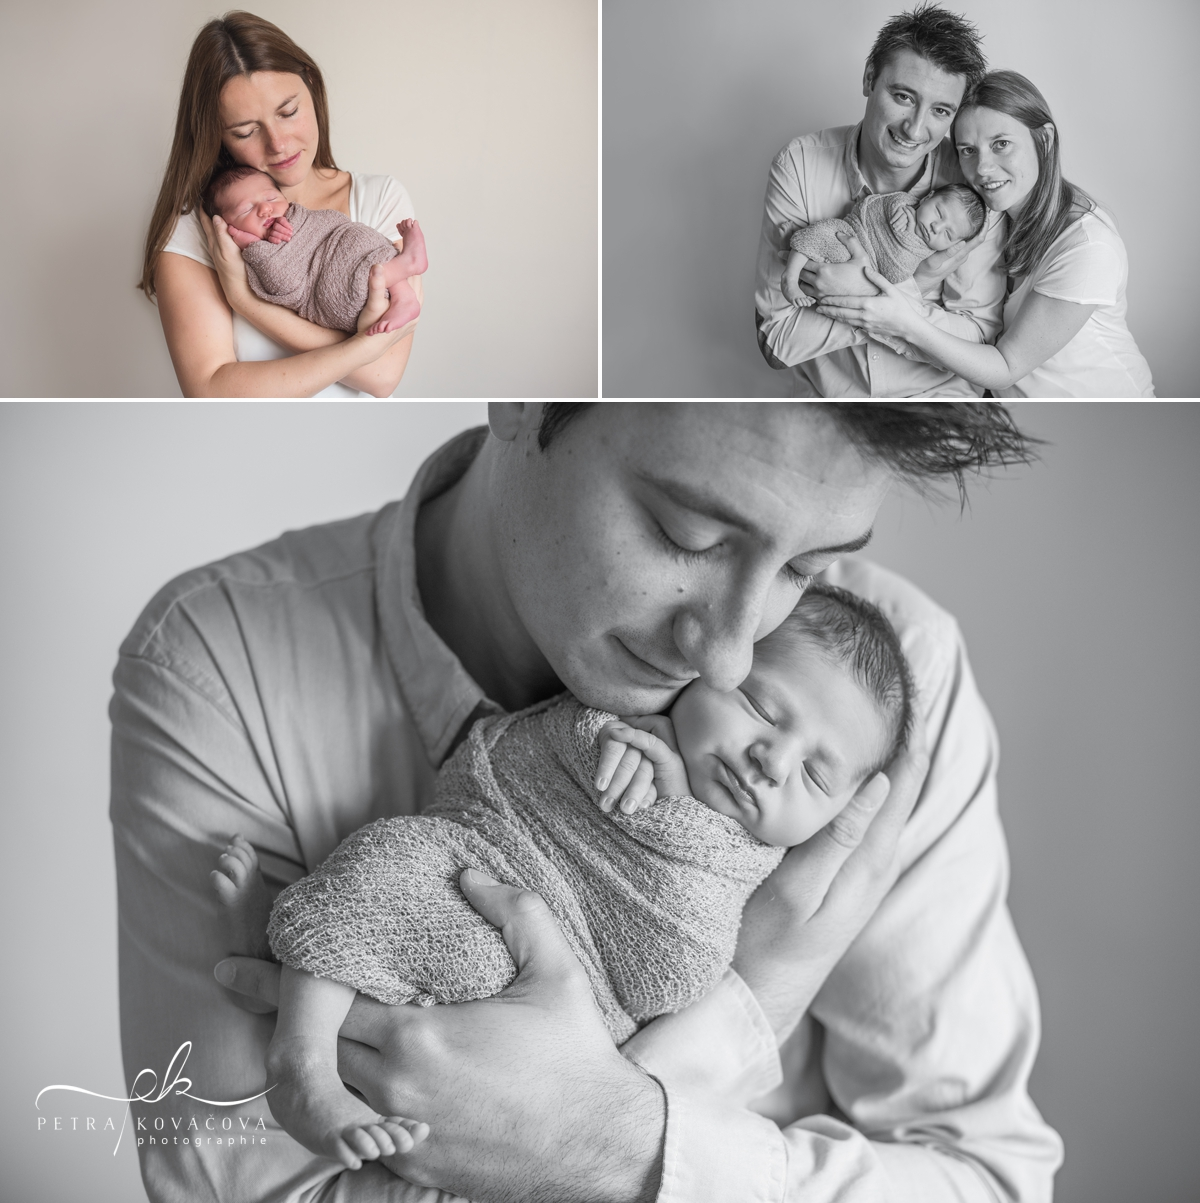 seance-photo-famille-avec-bebe-studio-rennes